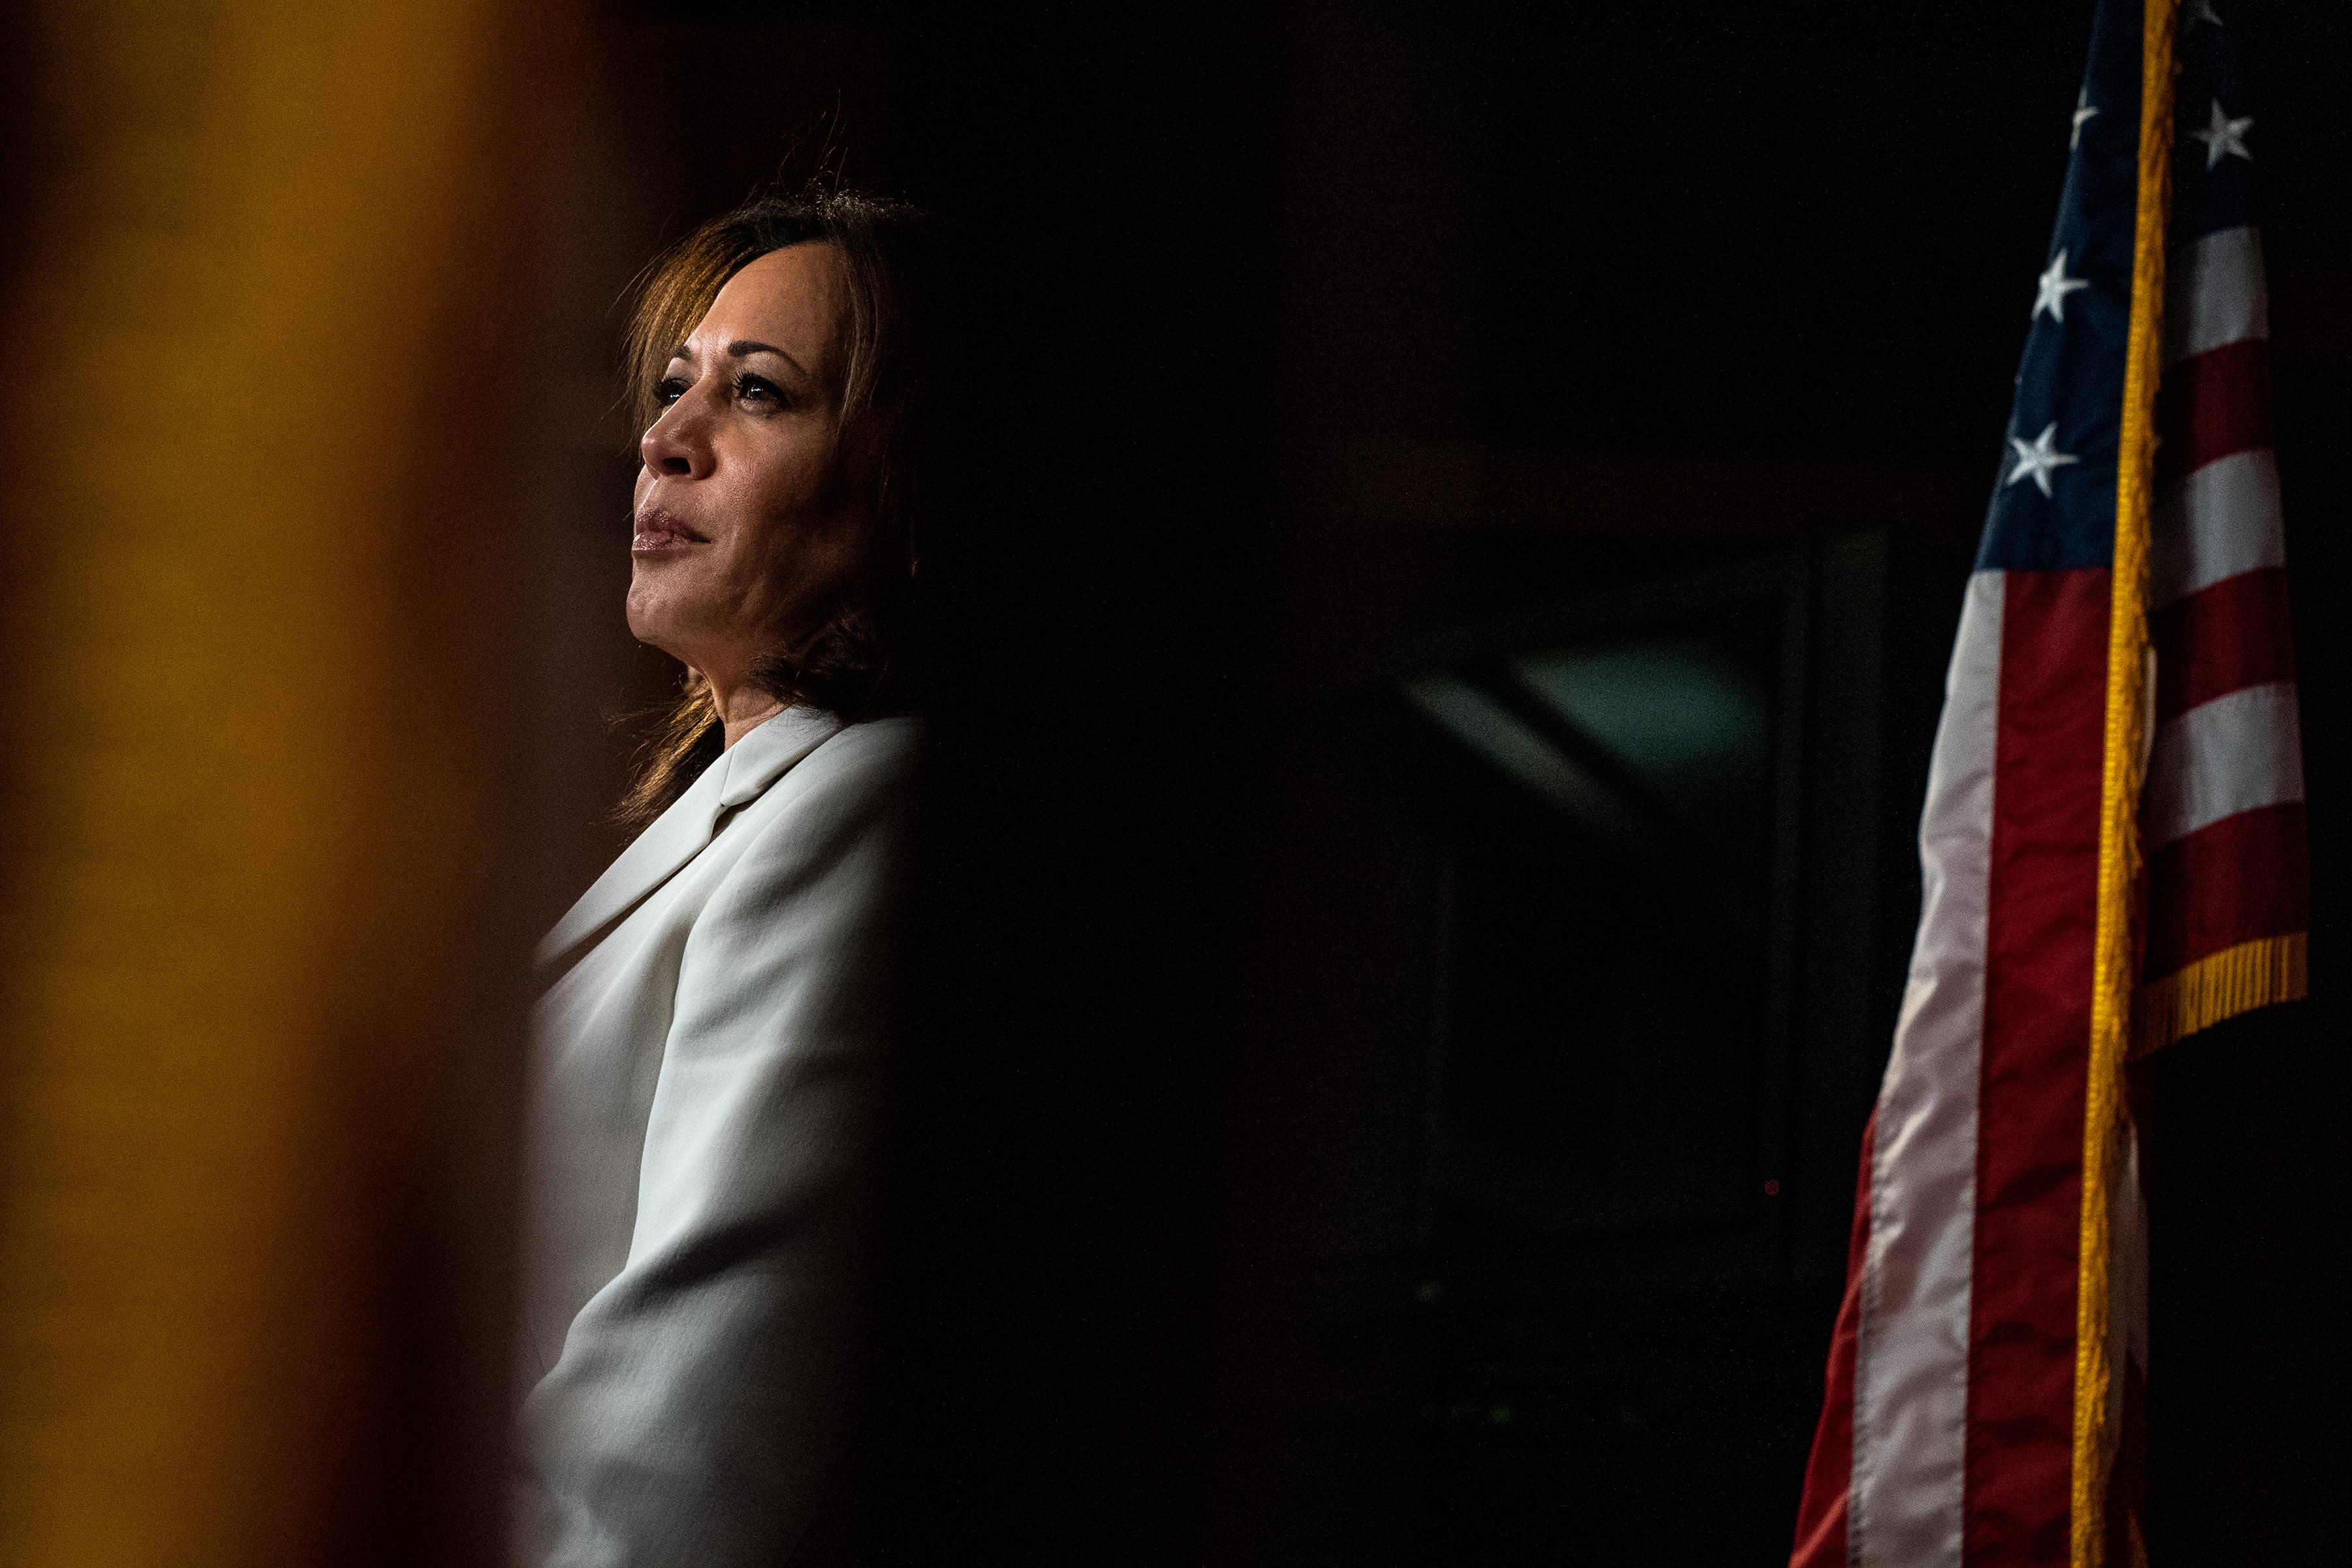 Kamala Harris Is Said to Be Weighing an Endorsement of Joe Biden